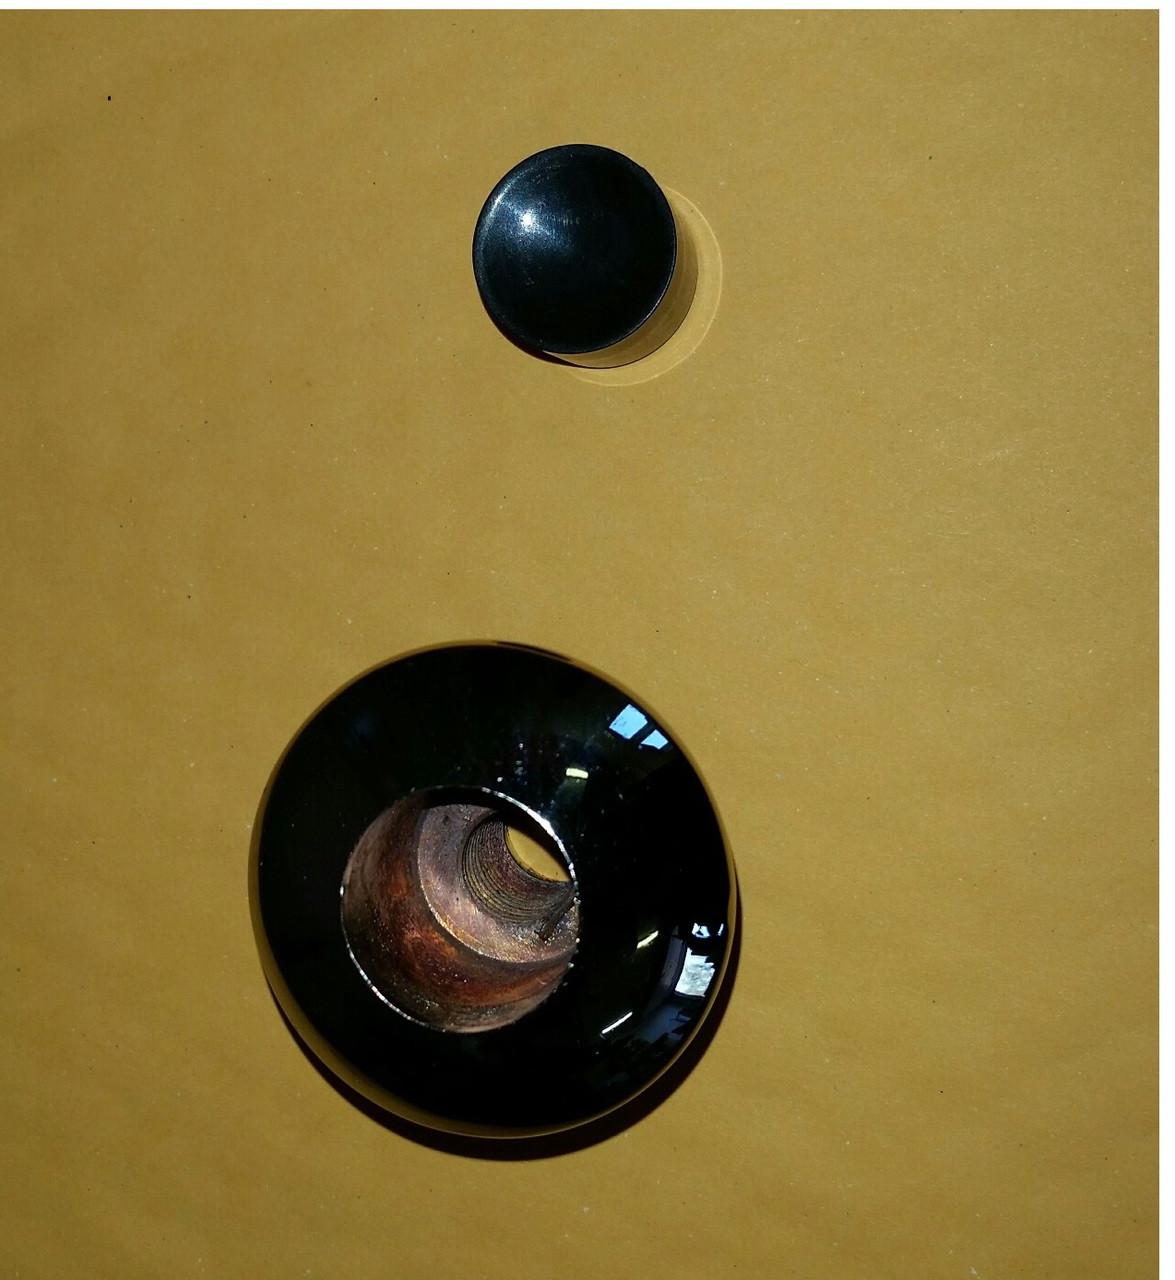 Shifter knob & button set